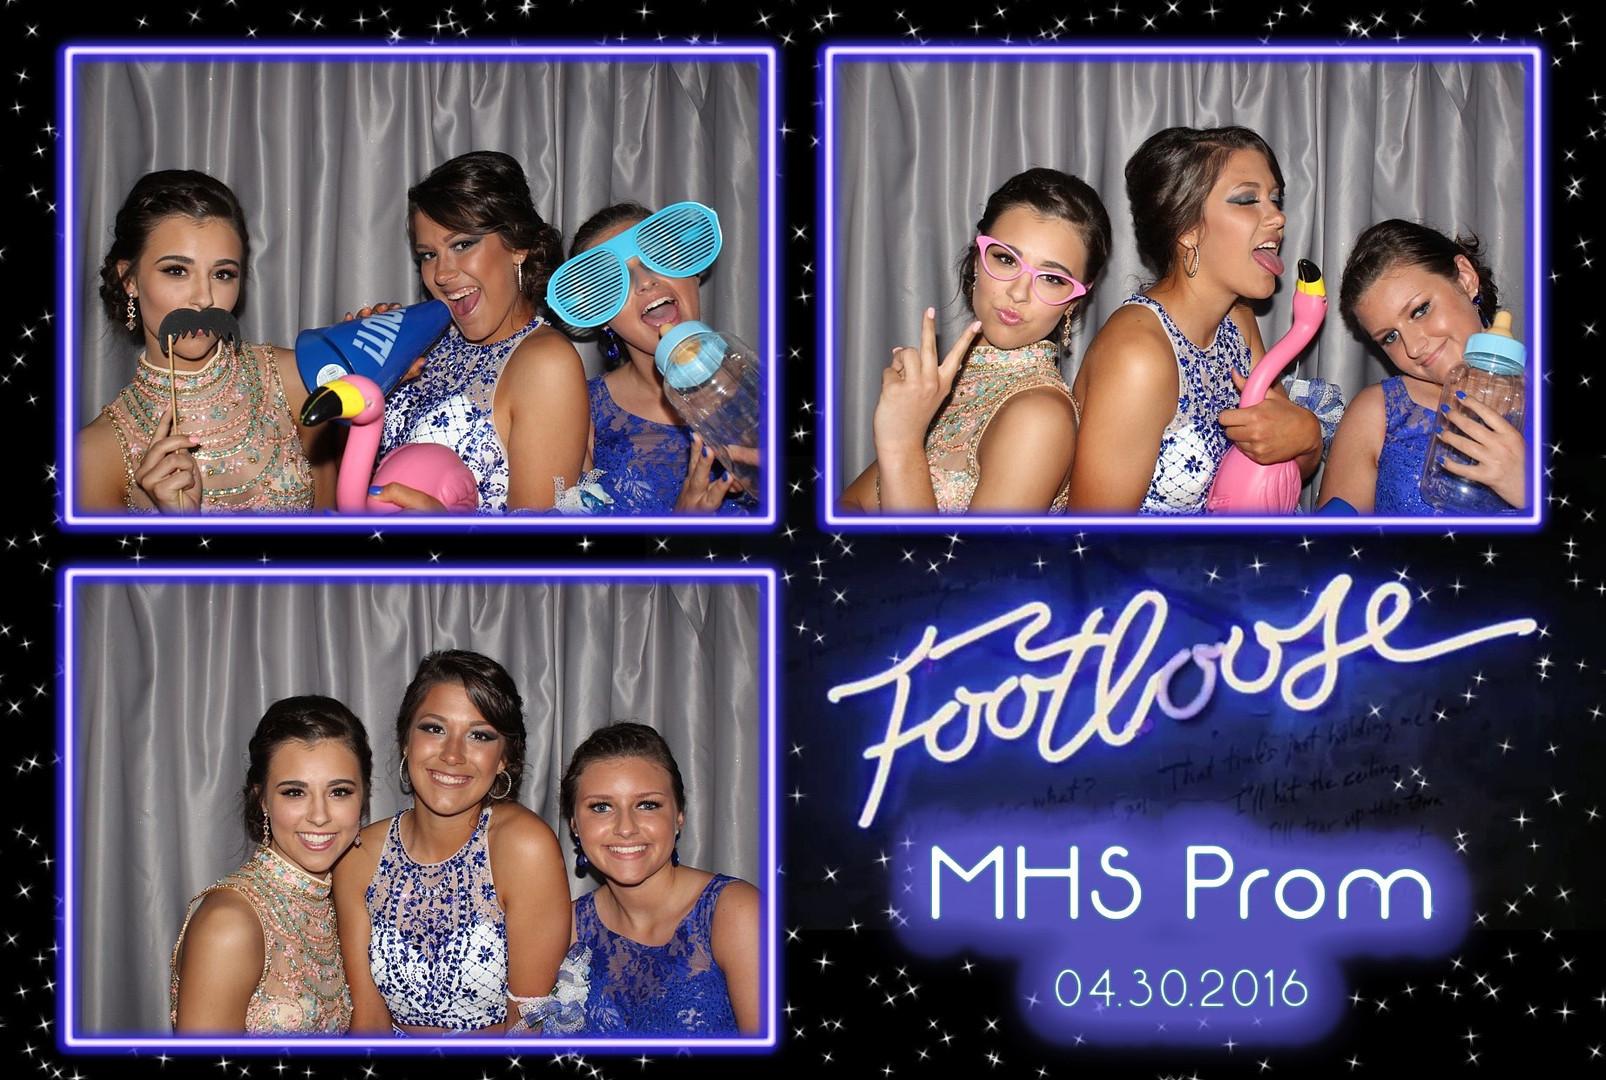 Murphysboro-HS-Prom.jpg